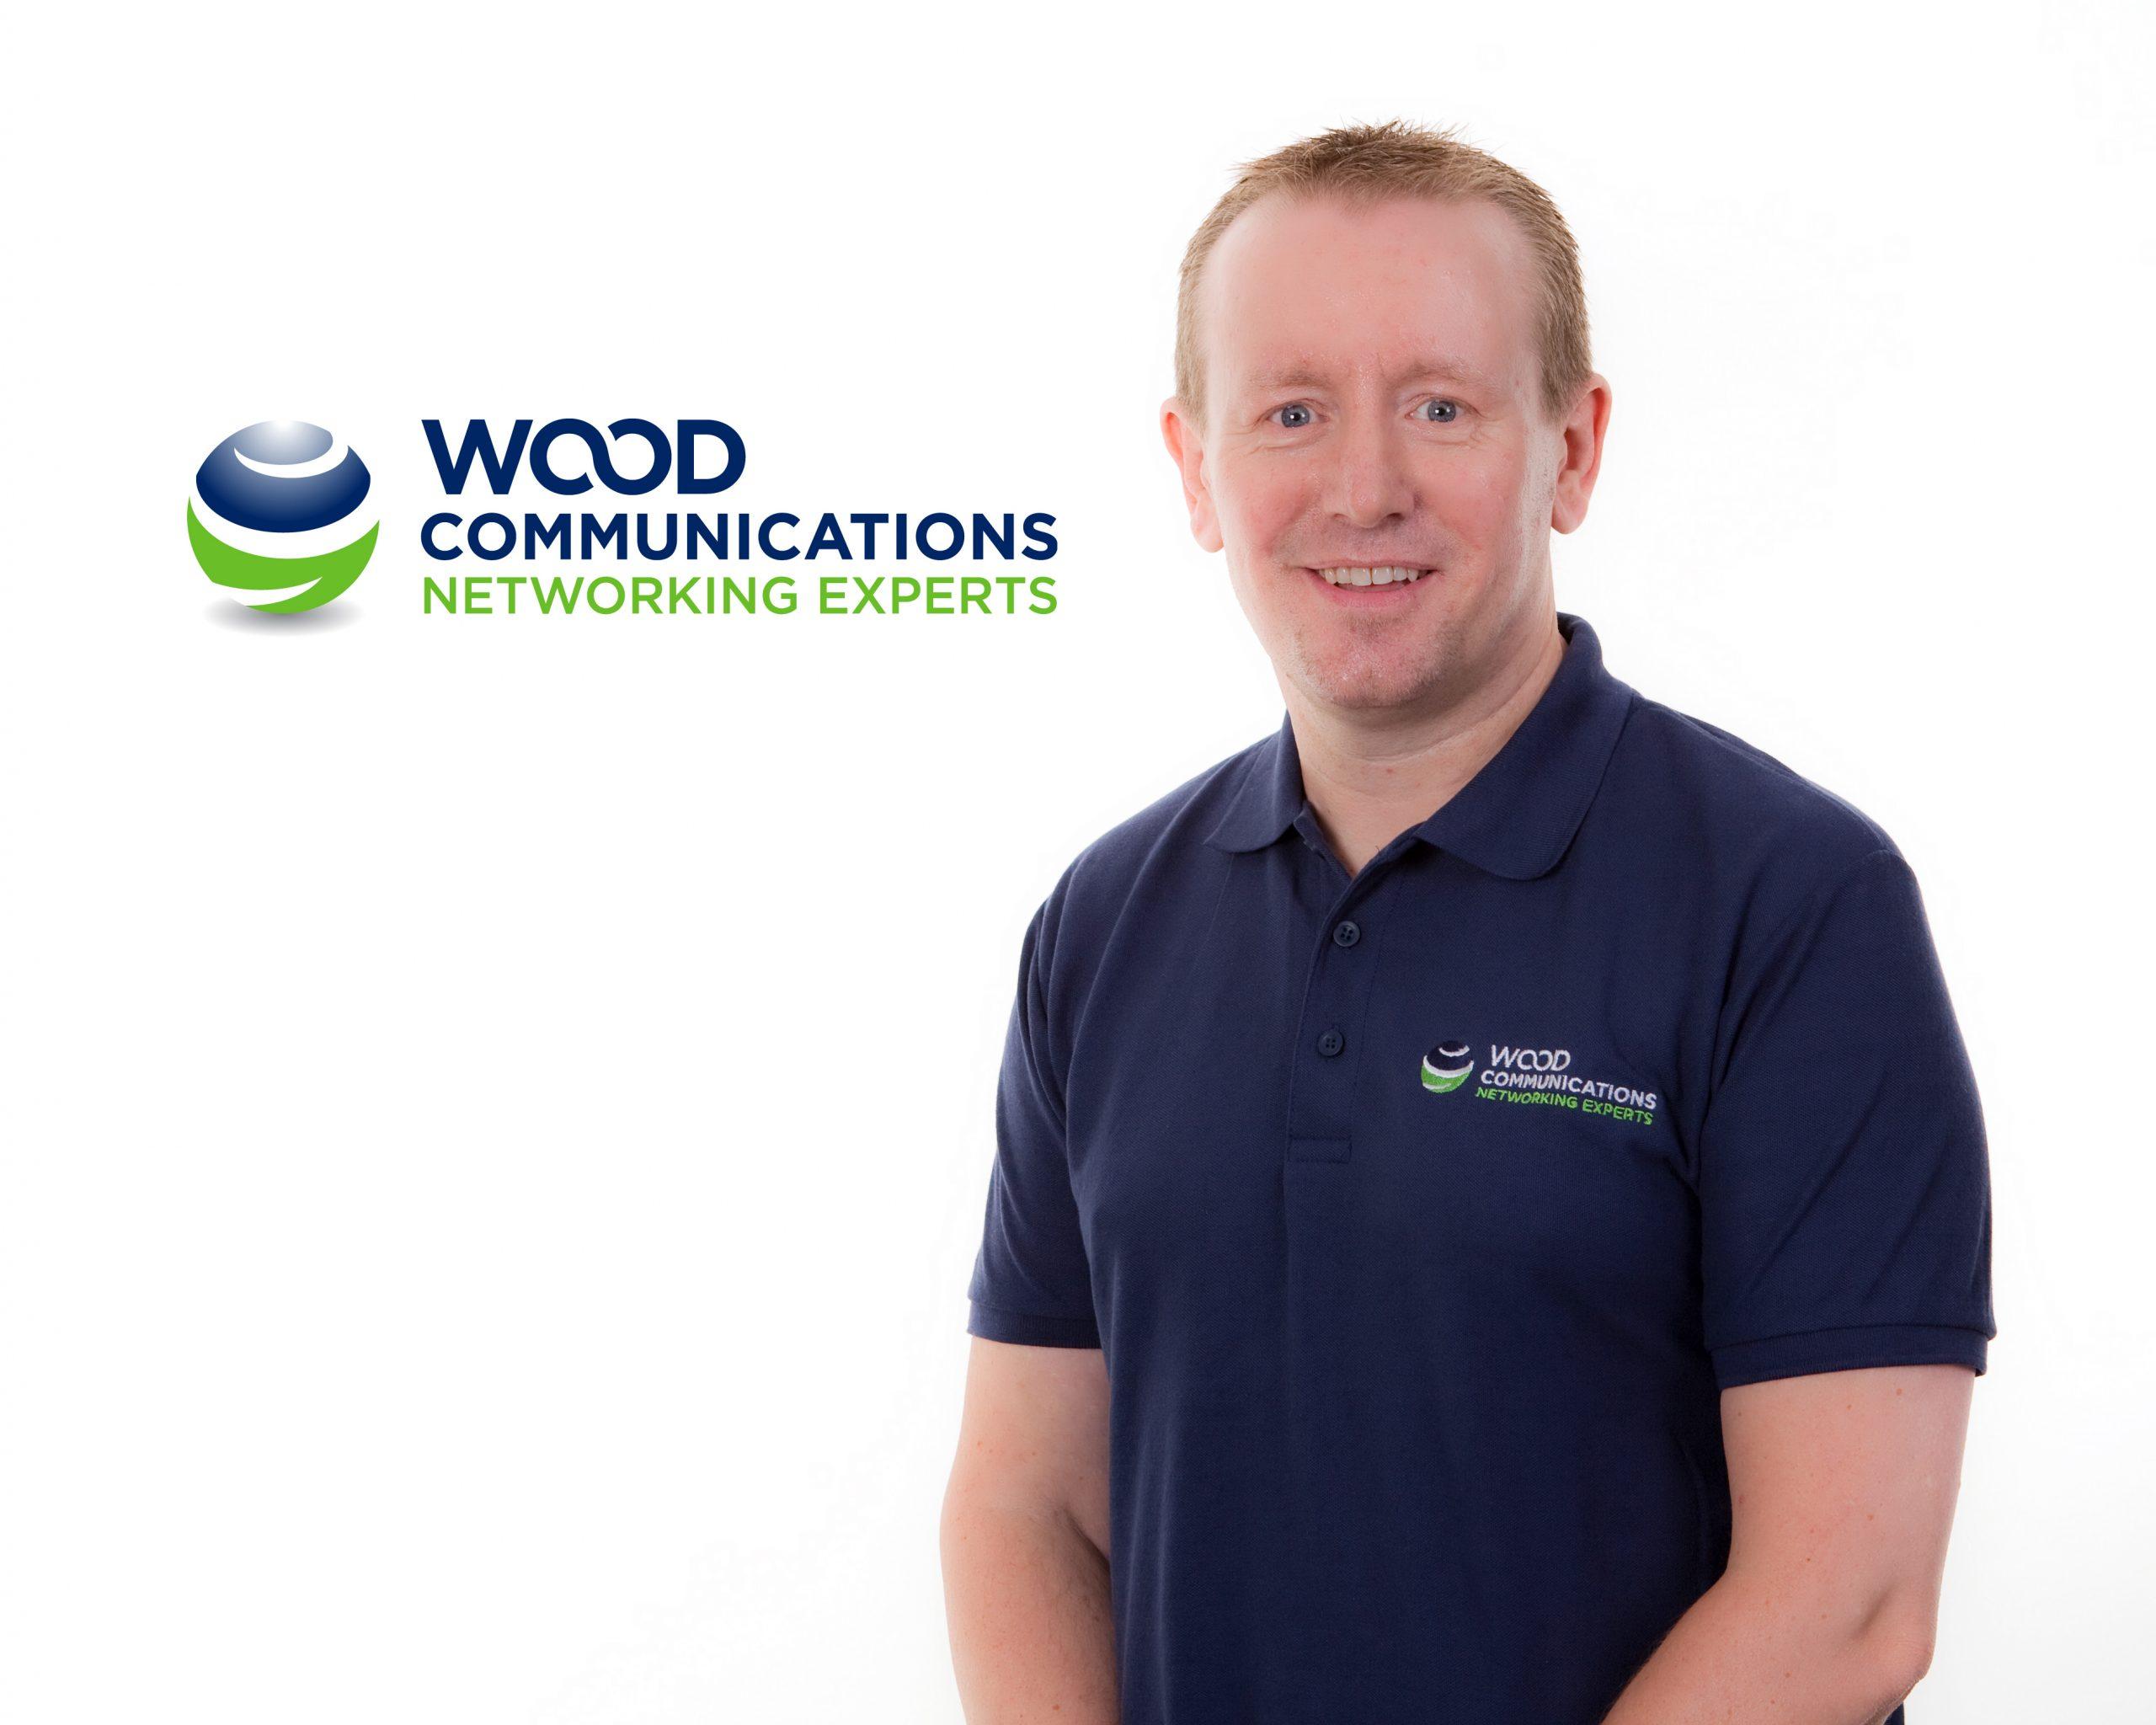 11. John MacMahon - wood communications networking expert